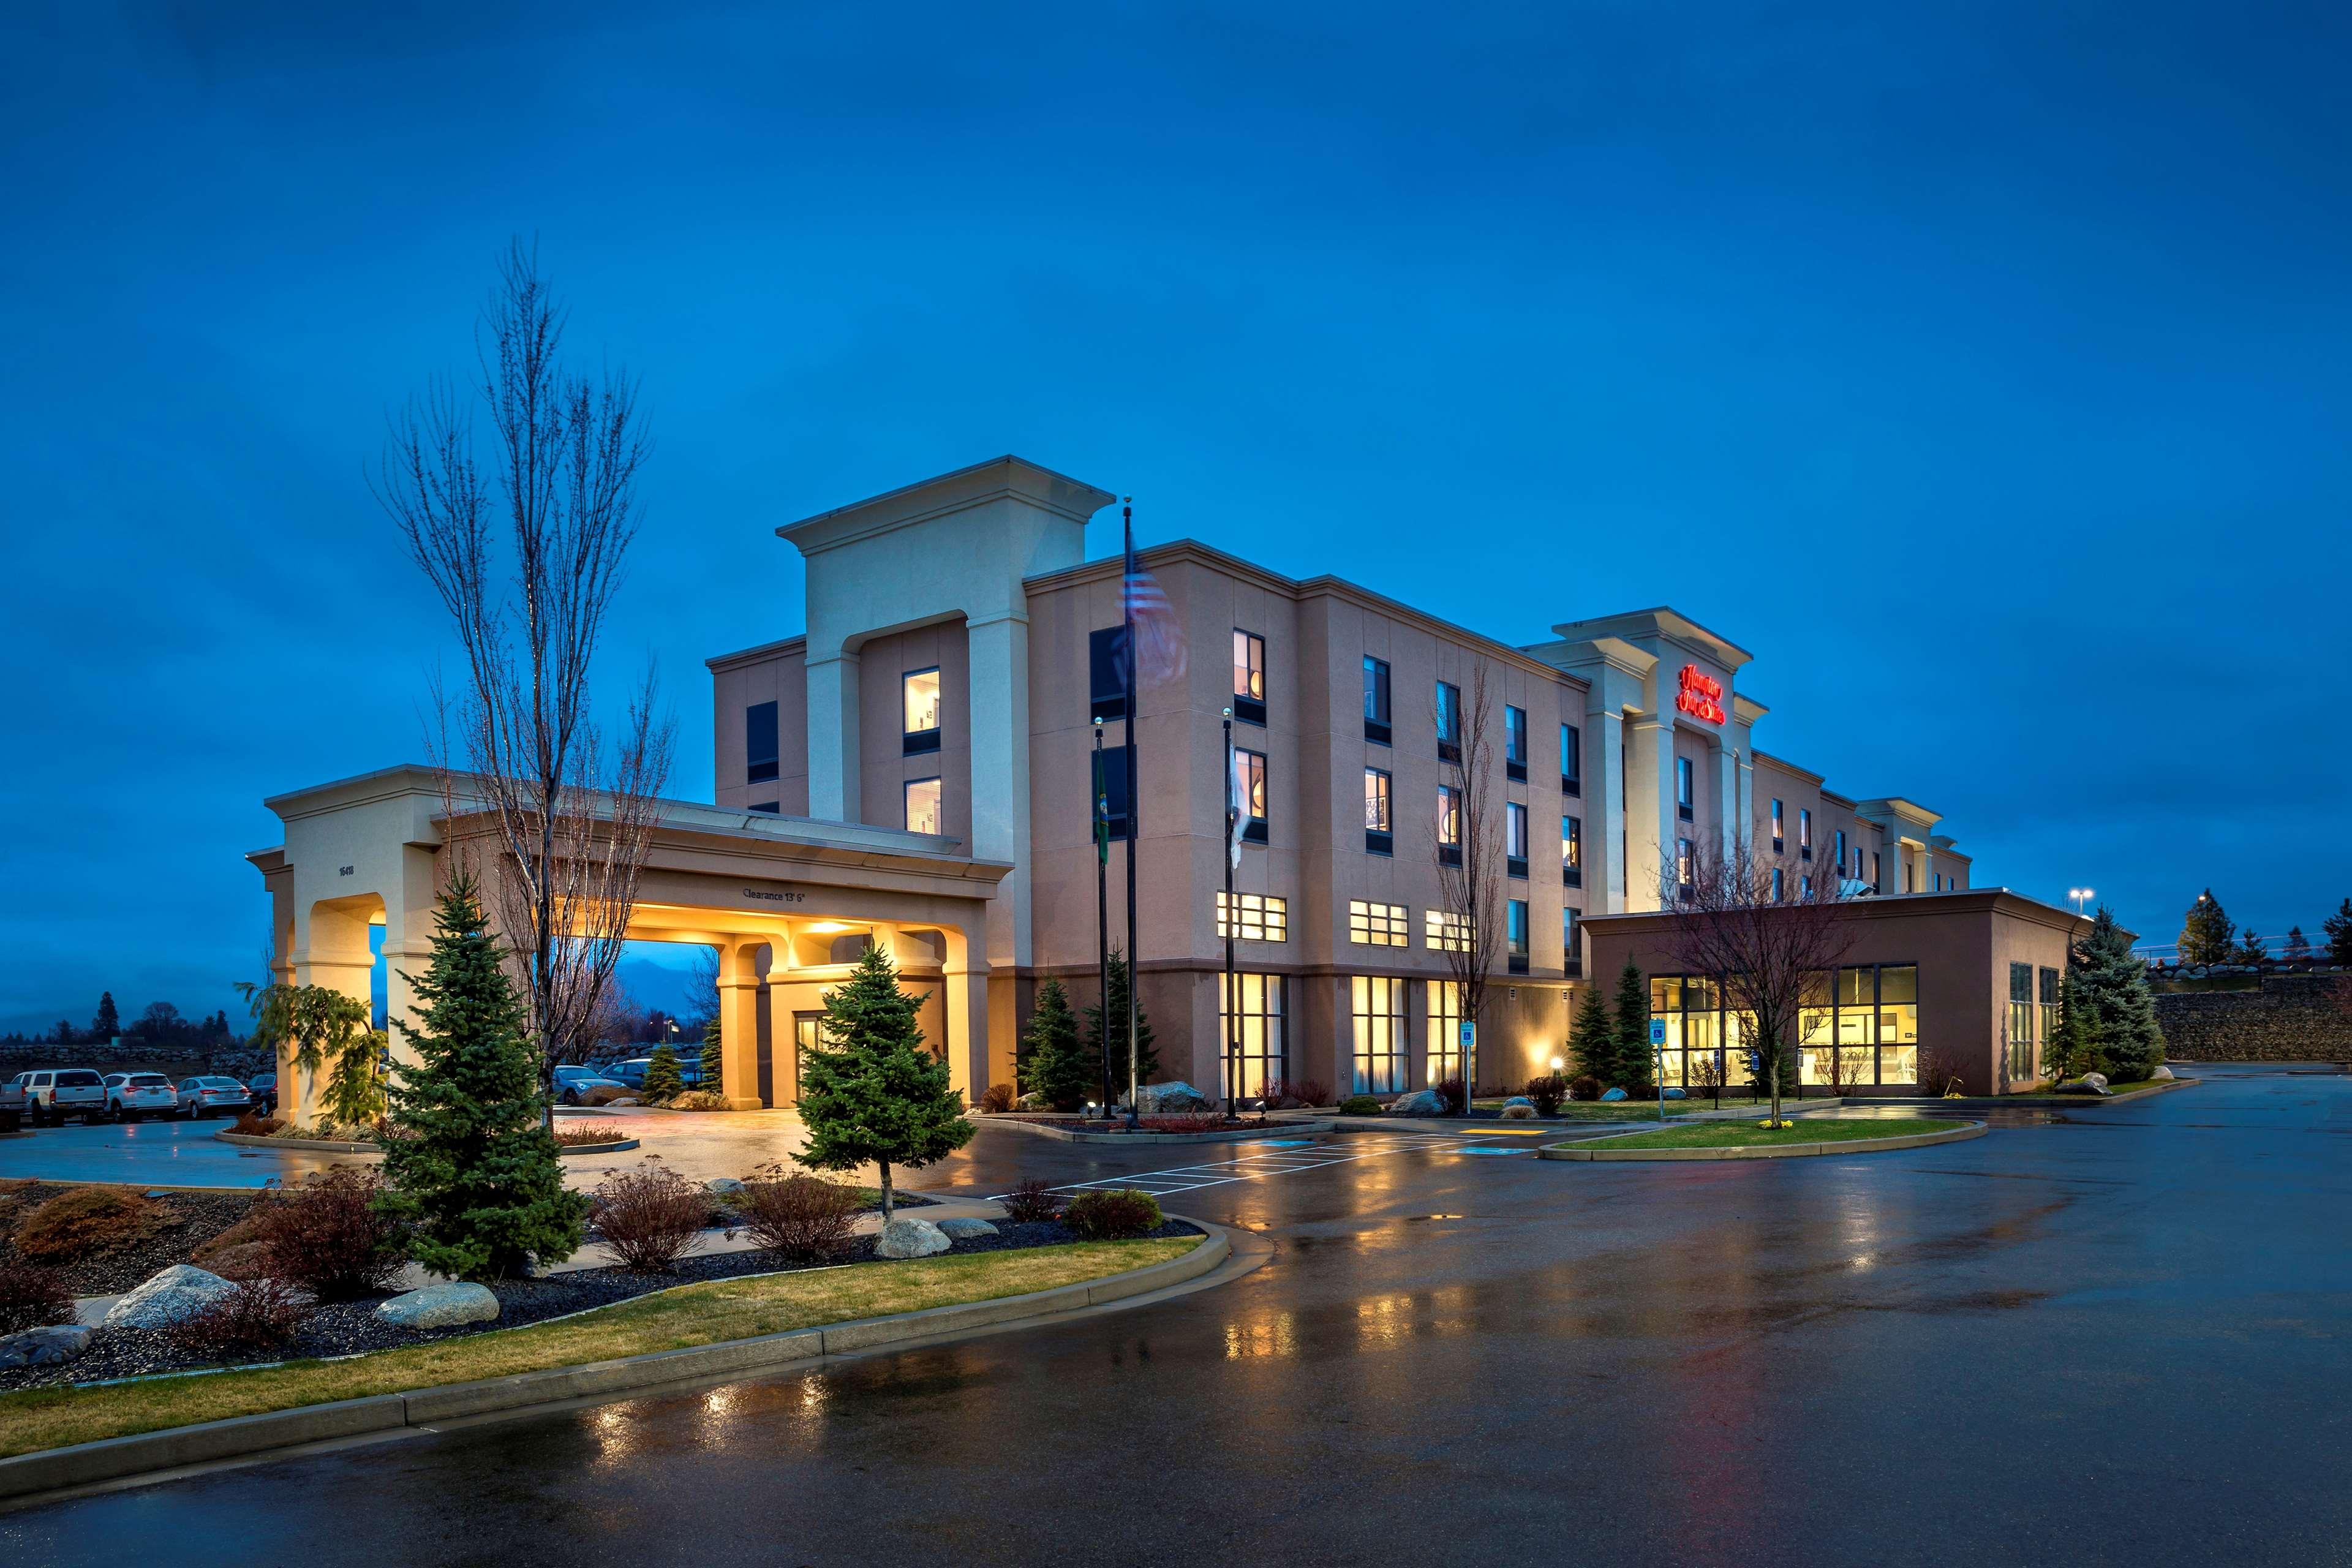 Hampton Inn & Suites Spokane Valley image 2